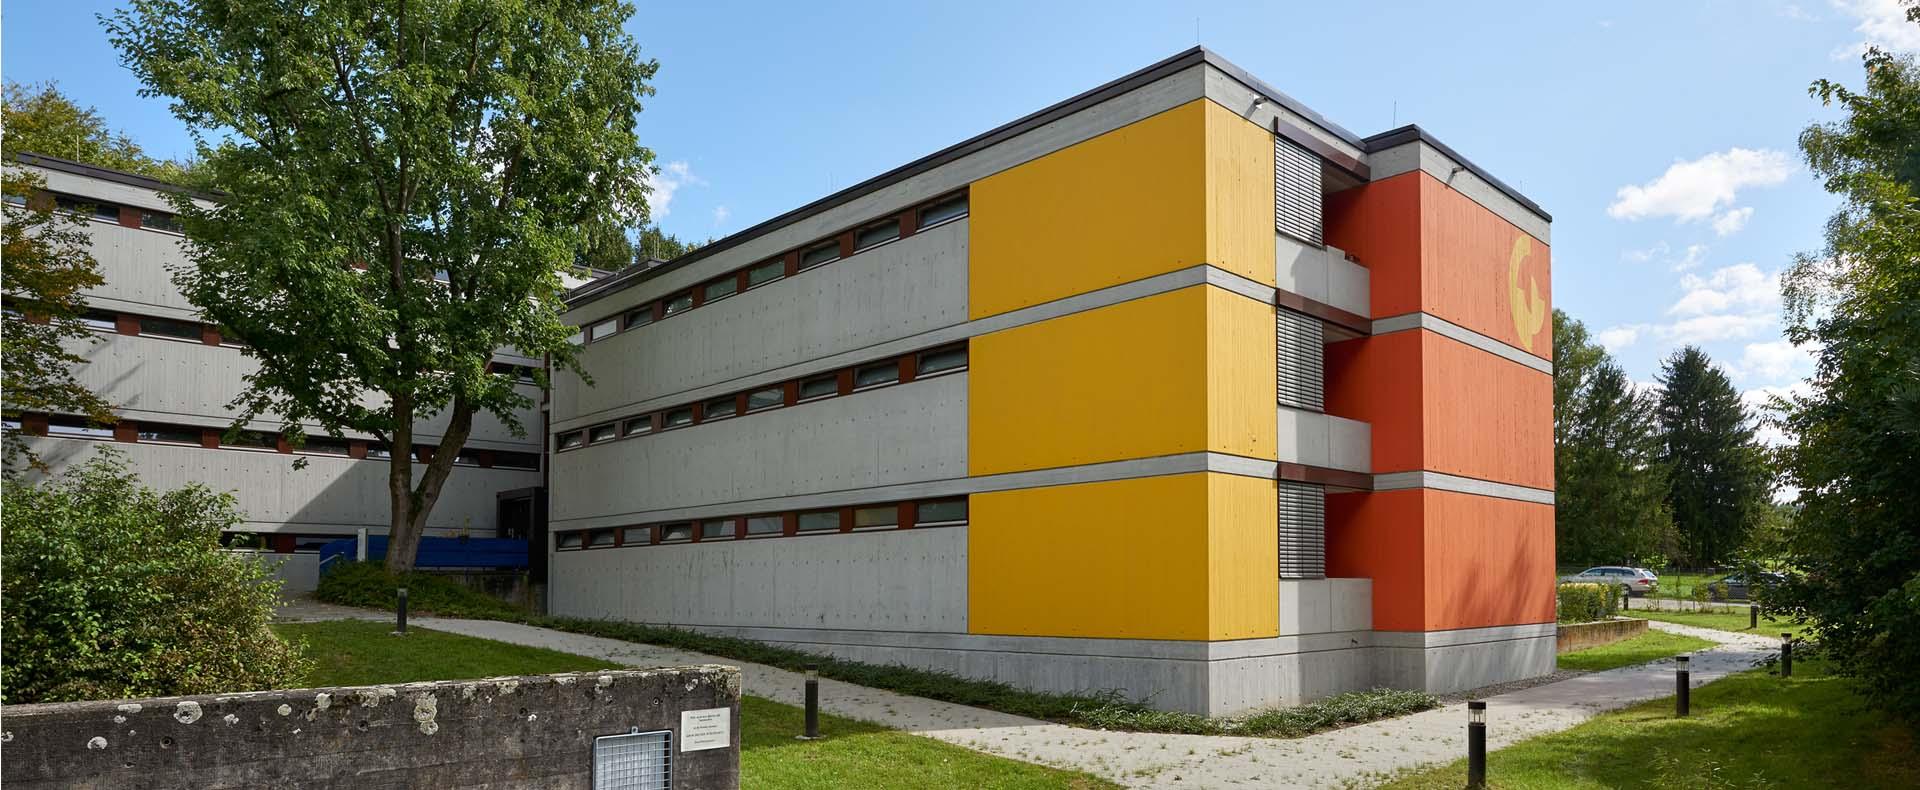 johannes wagner schule in n rtingen l e k architekten. Black Bedroom Furniture Sets. Home Design Ideas